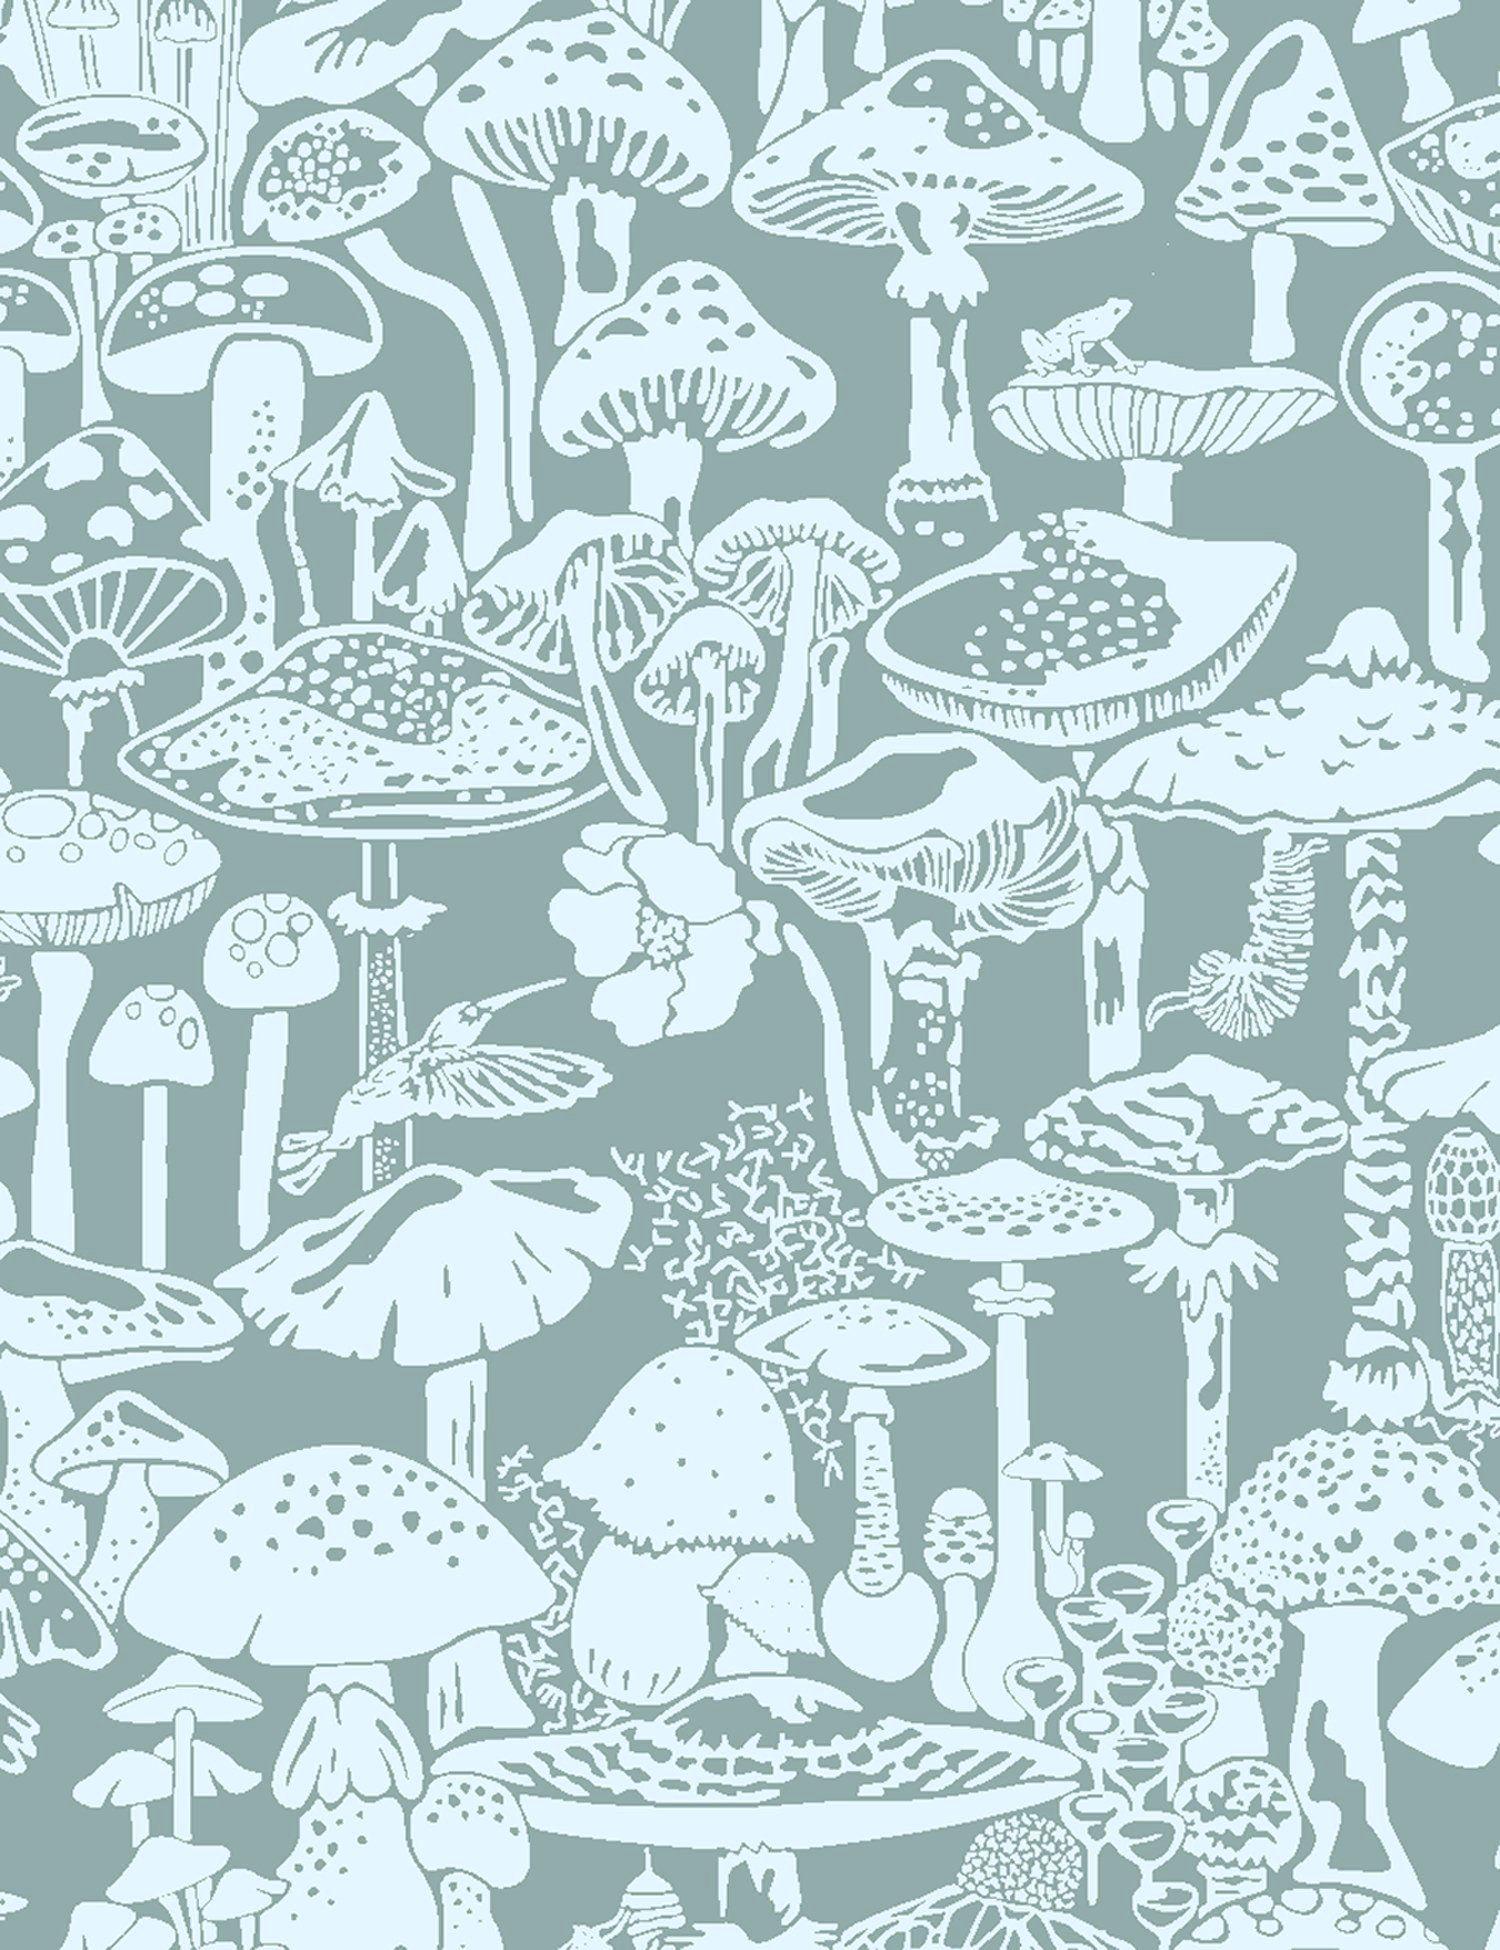 Mushroom City Botanica